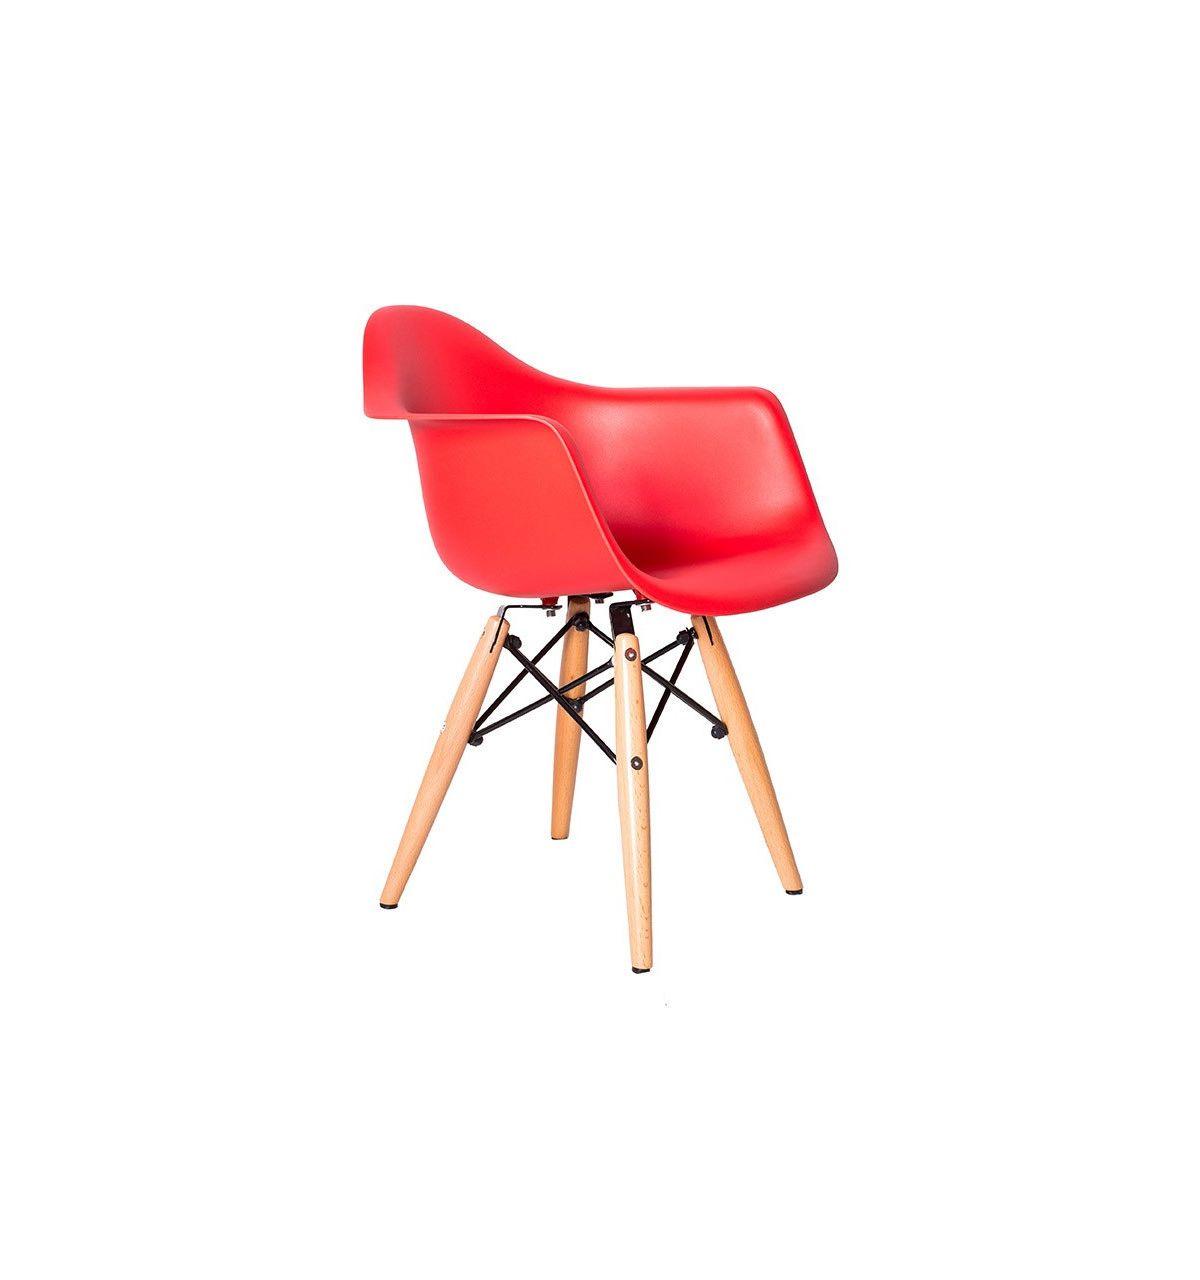 c r eames arm chair daw design for kids. Black Bedroom Furniture Sets. Home Design Ideas